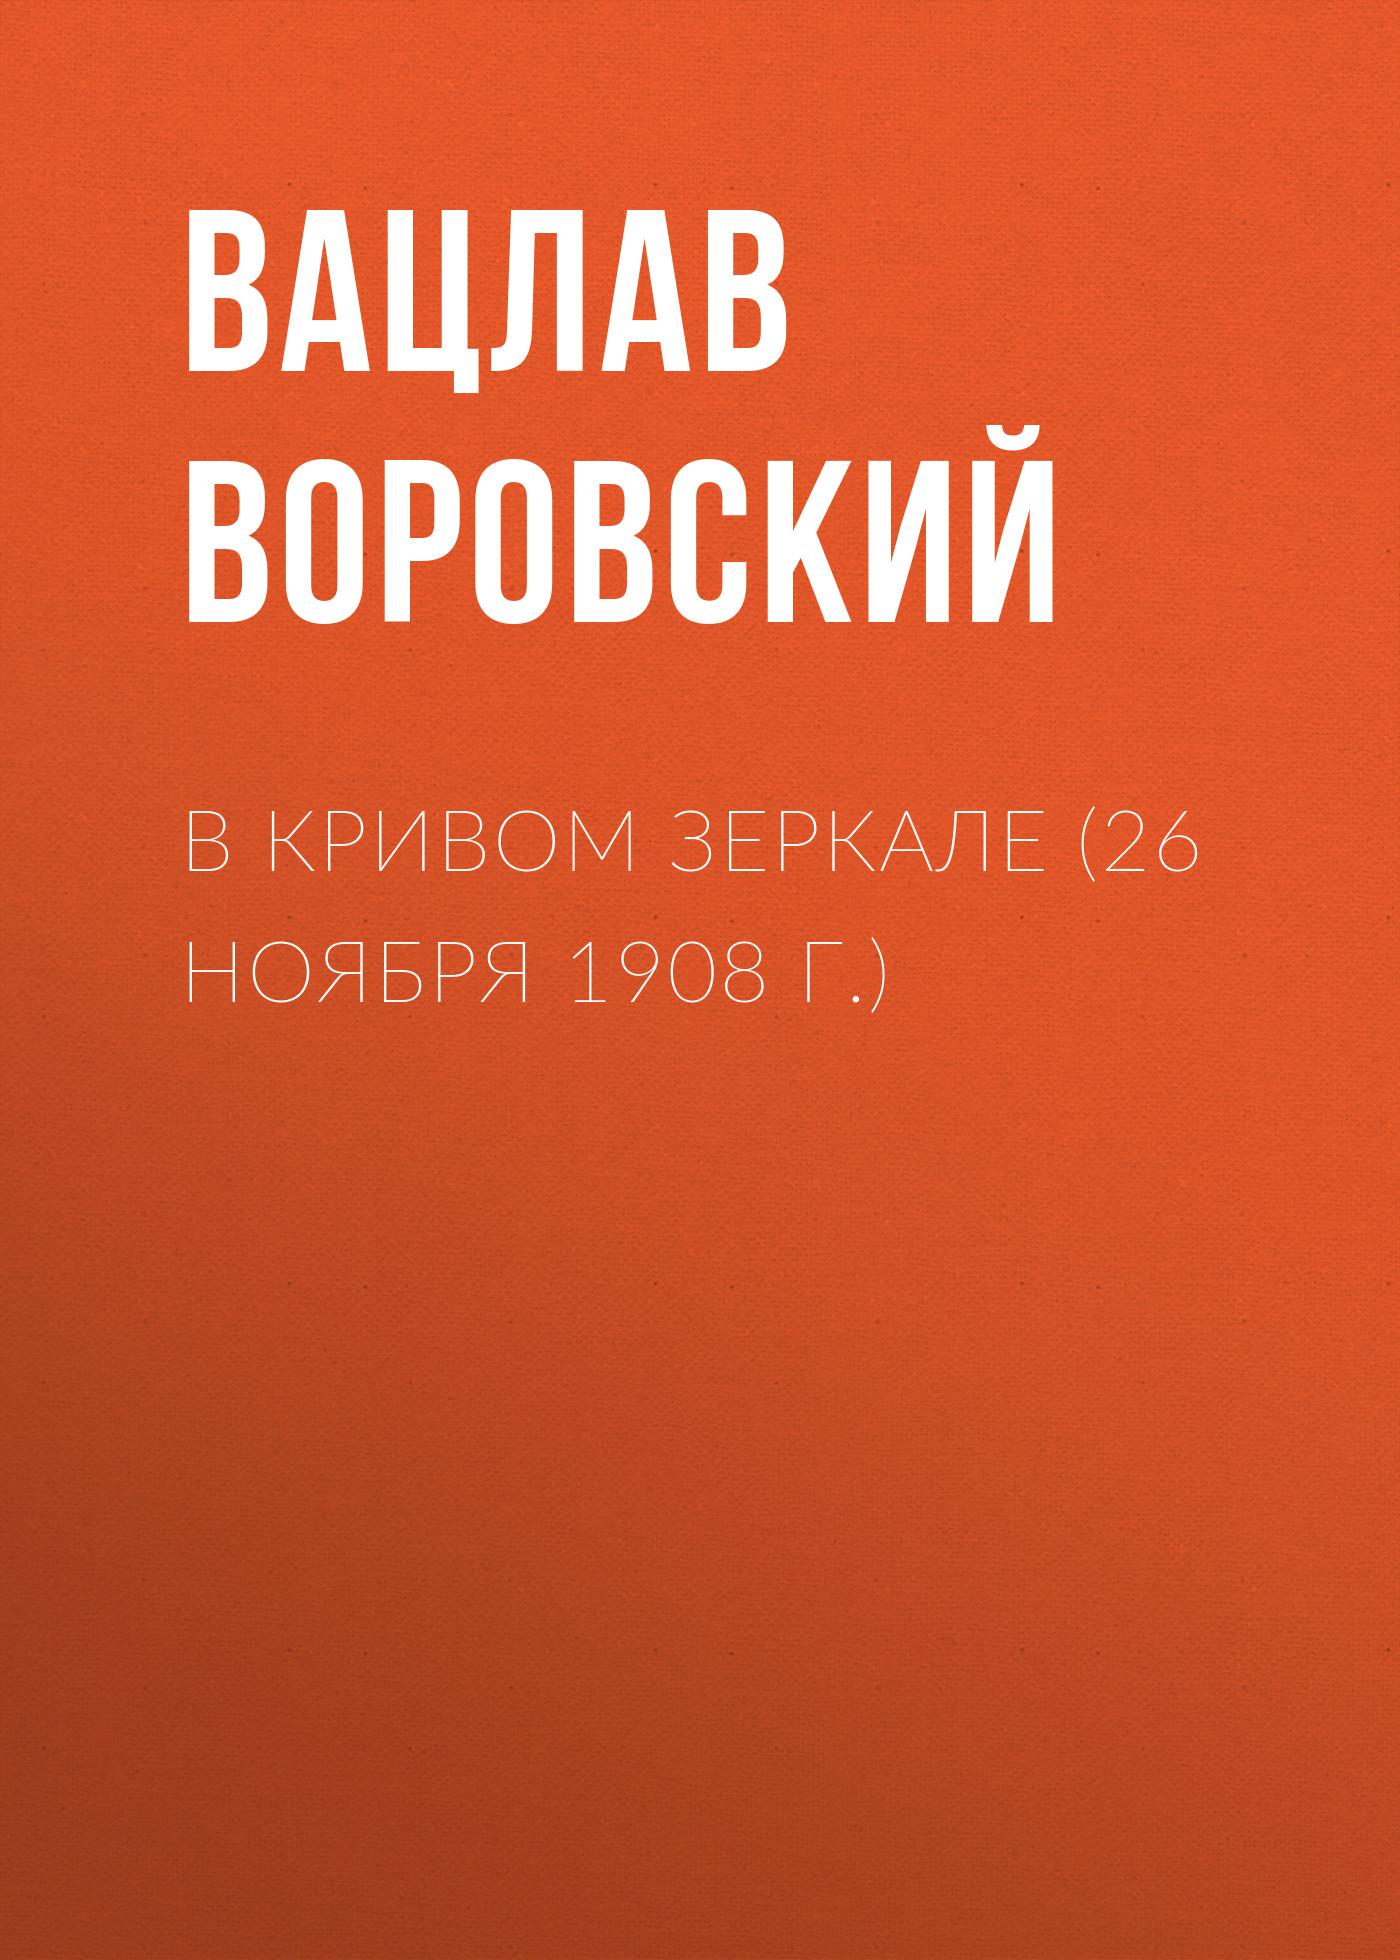 Вацлав Воровский В кривом зеркале (26 ноября 1908 г.) вацлав воровский в кривом зеркале 10 декабря 1908 г